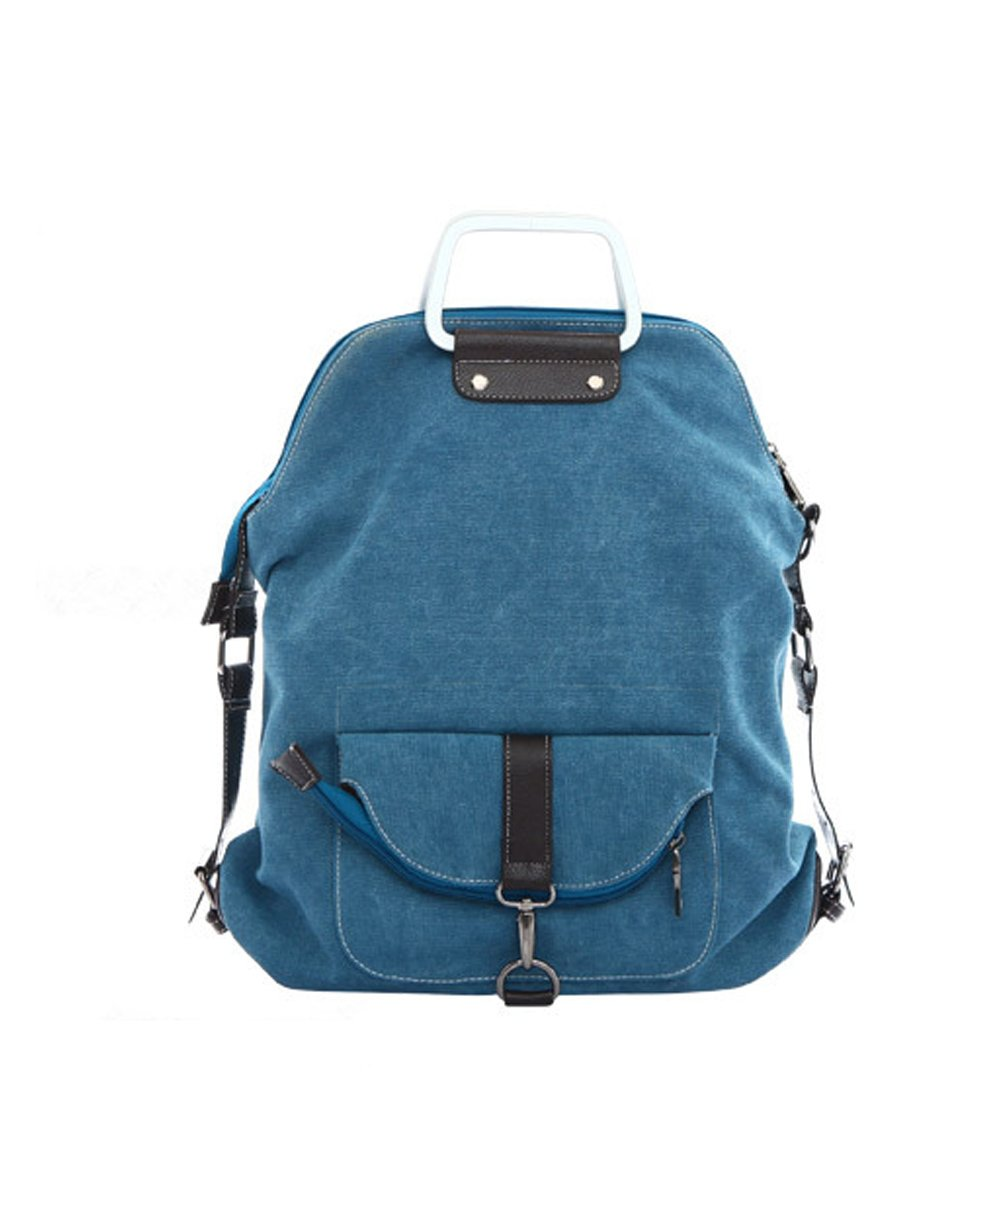 Flowertree Canvas Backpack Convertible Tote Crossbody Shoulder Bag (blue)